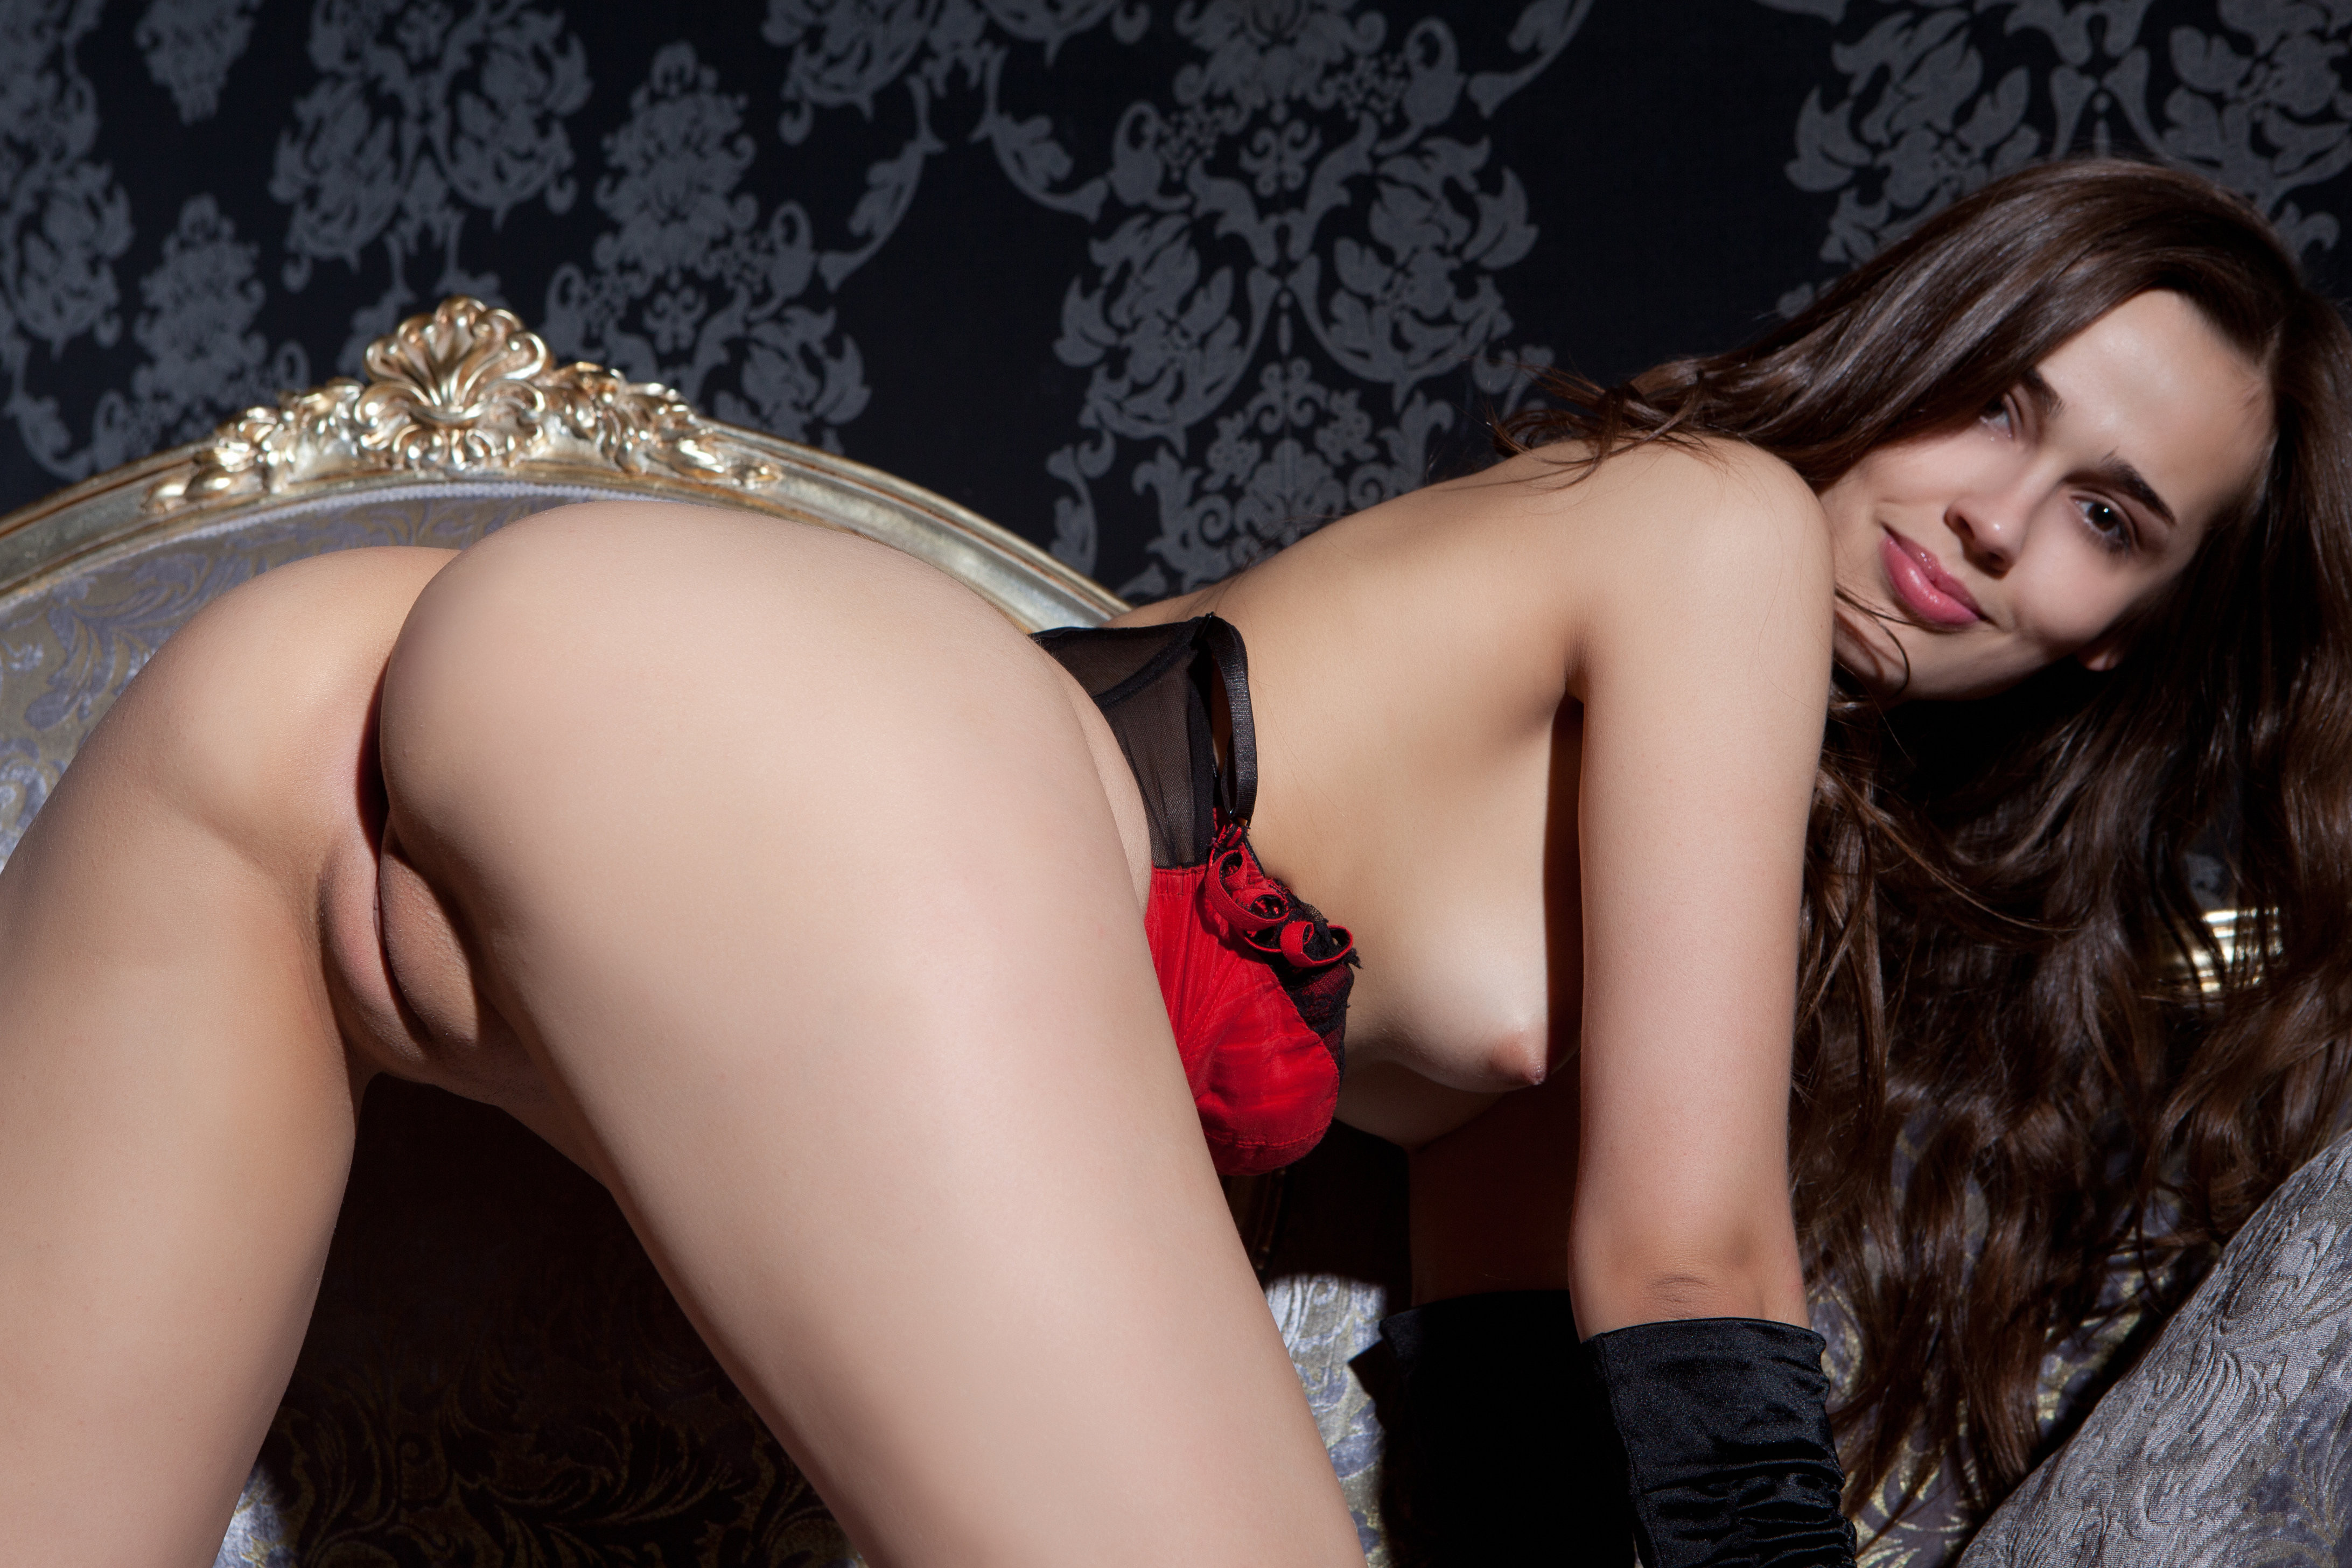 обои Trista A, Danea, модель, красотка картинки фото